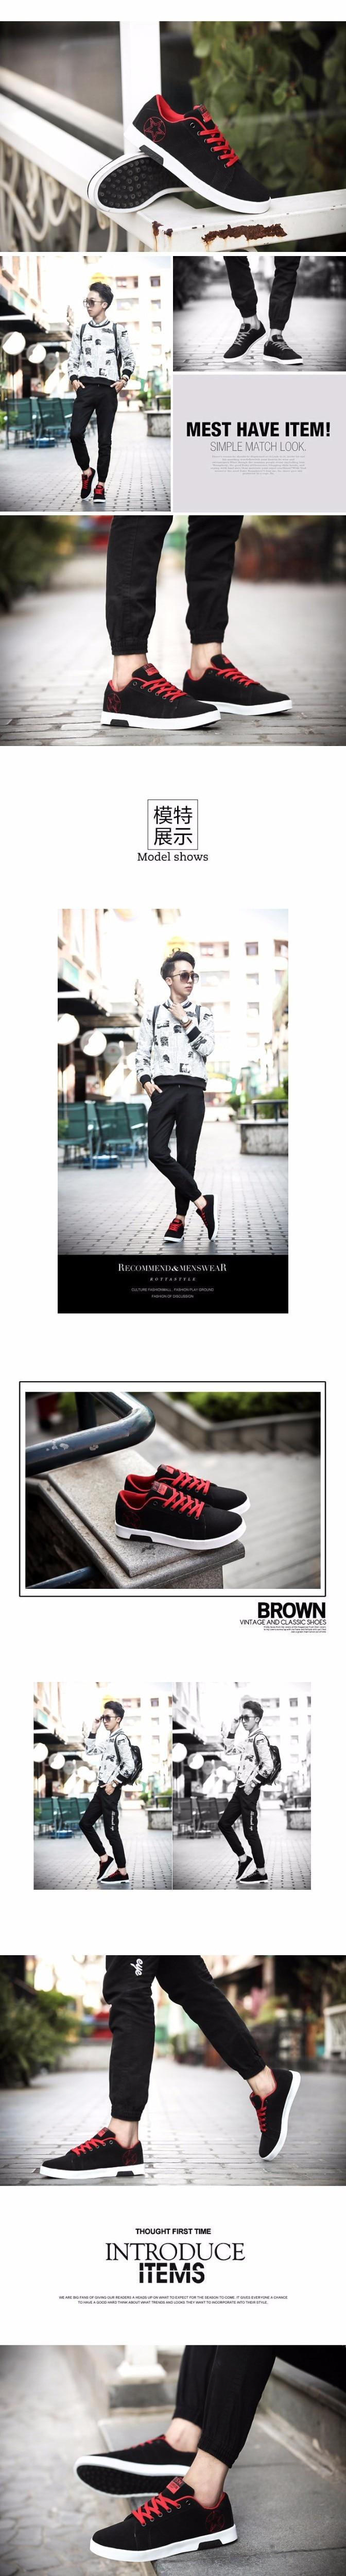 Geguistle 2018 Spring Autumn Fashion Shoes Men's Casual Shoes Breathable New Men Canvas Shoes Gay Male Lace up Shoes5